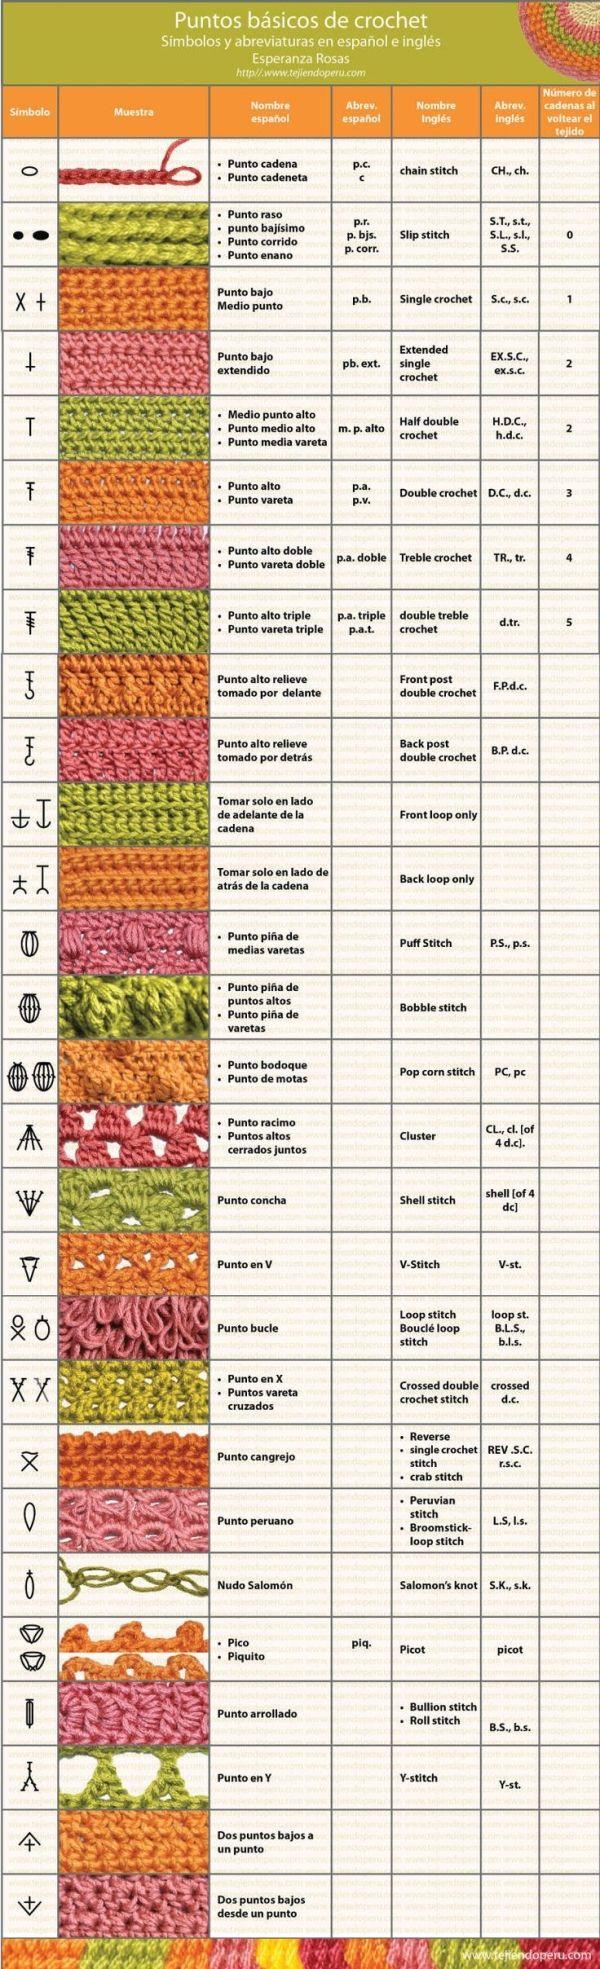 Crochet stitches by GammasFive